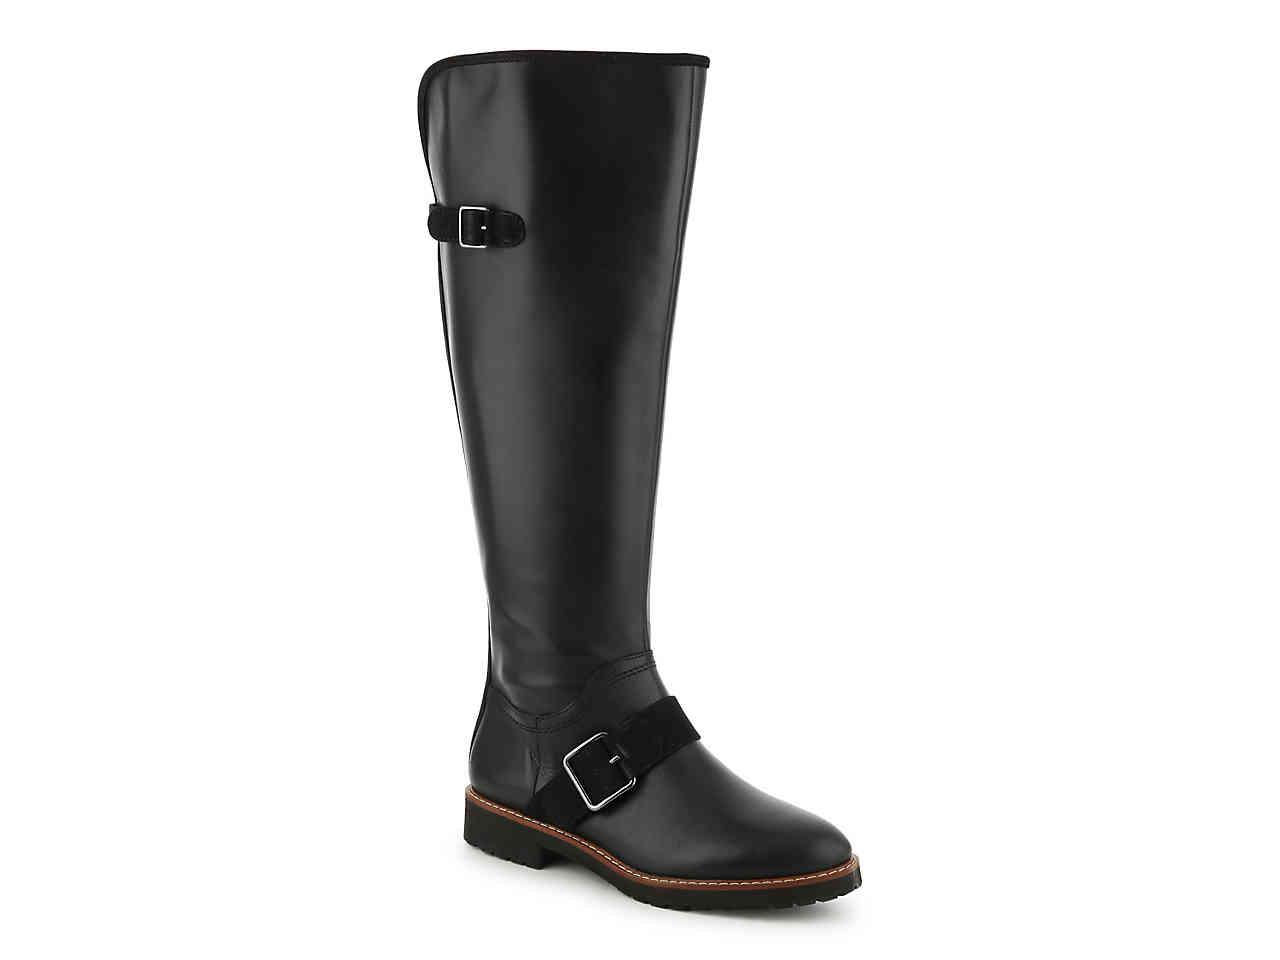 4c63a308bb2 Lyst - Franco Sarto Cutler Wide Calf Riding Boot in Black